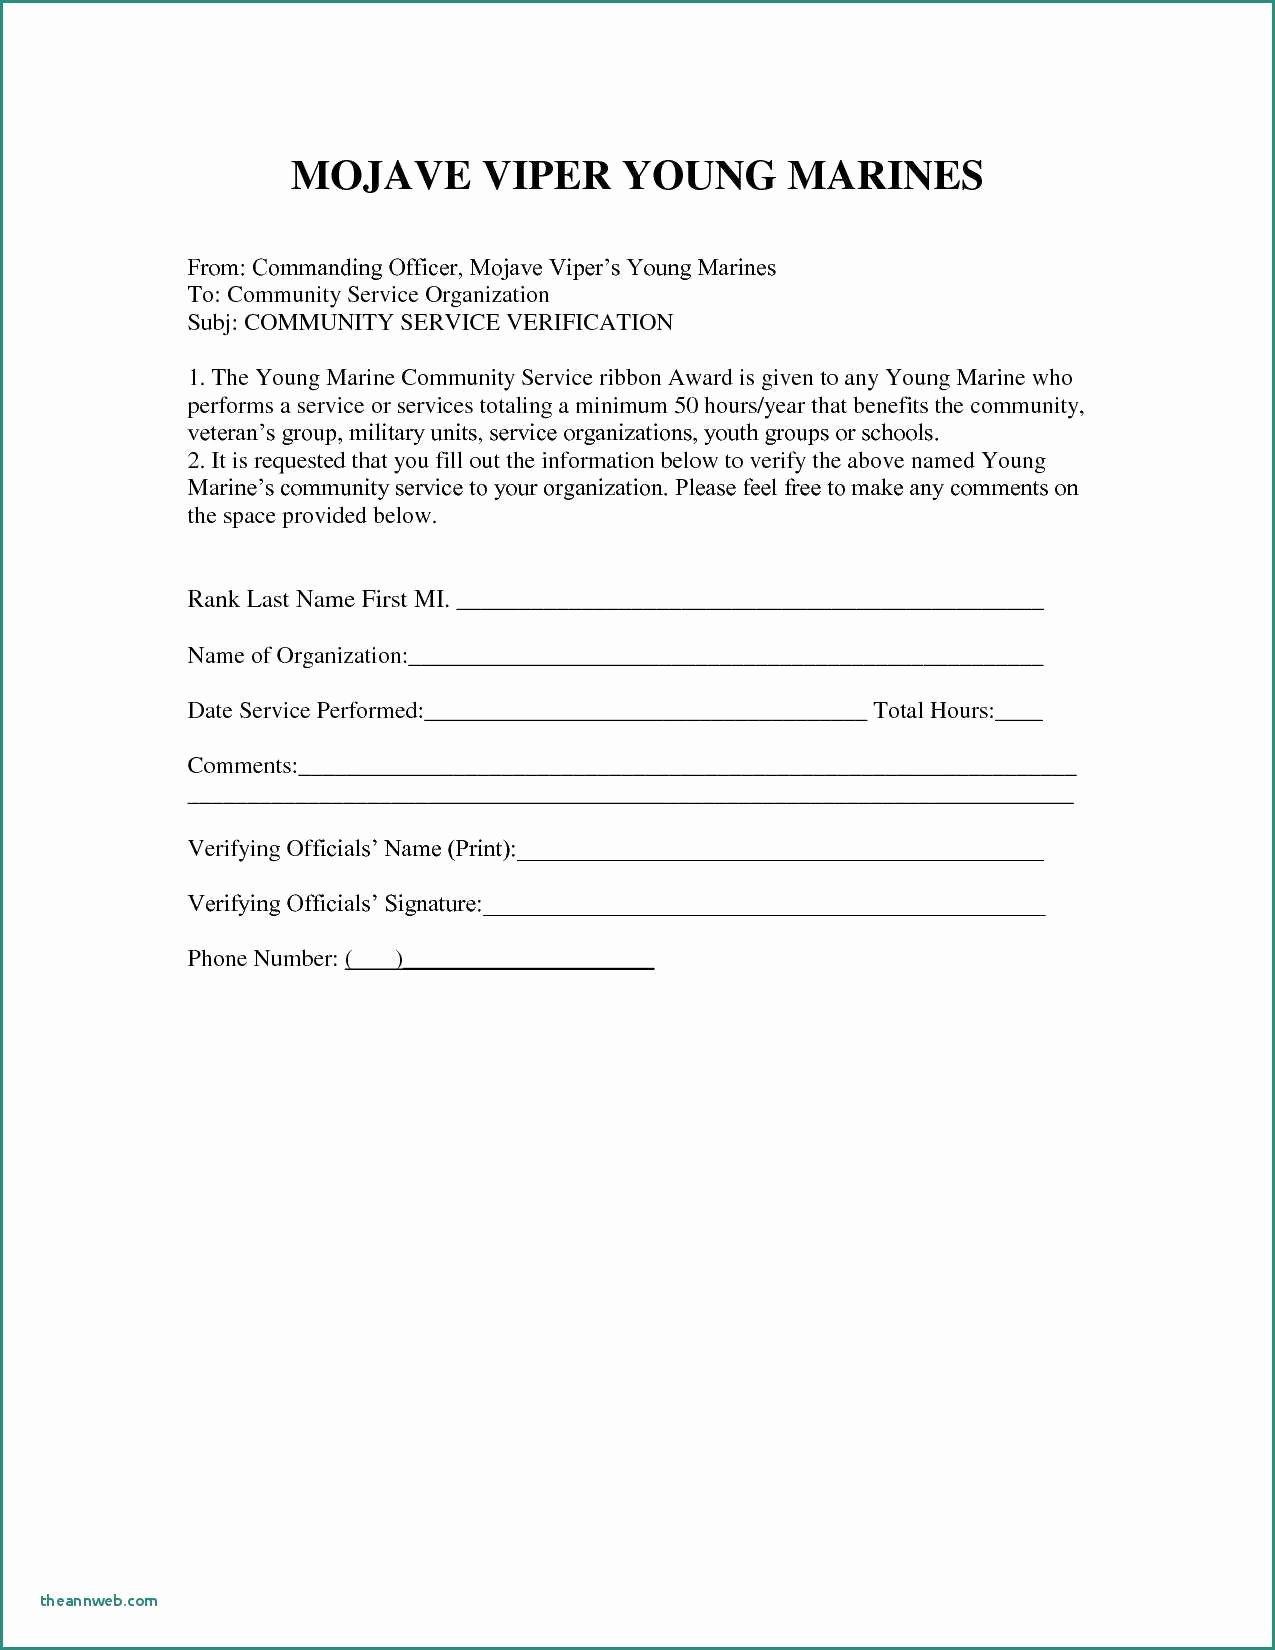 Delta Sigma theta Recommendation Letter Elegant Sample Interest Letter for Delta Sigma theta